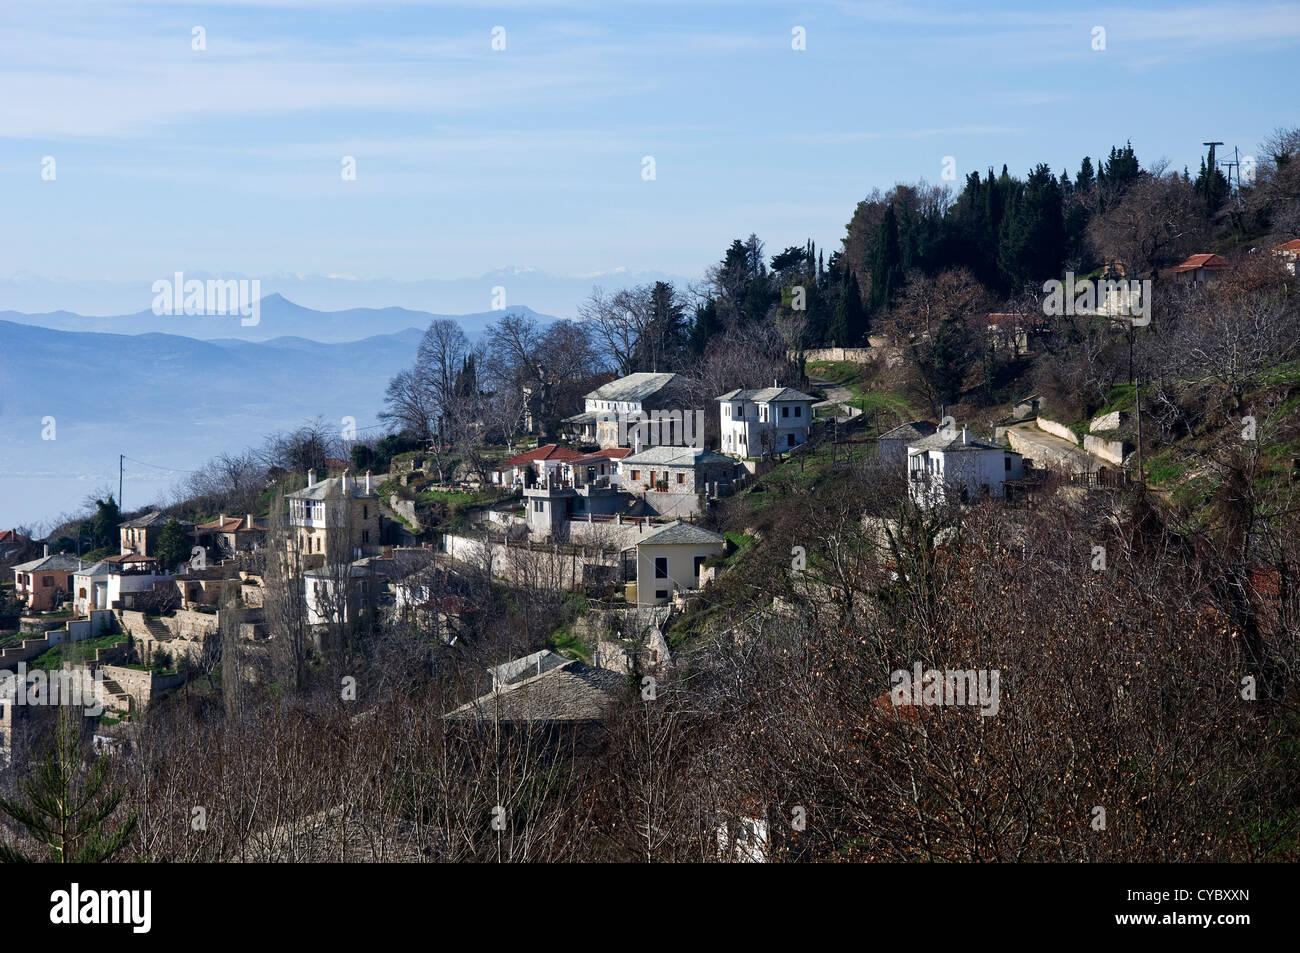 Mountain village Agios Georgios in winter (Pelion Peninsula, Thessaly, Greece) - Stock Image